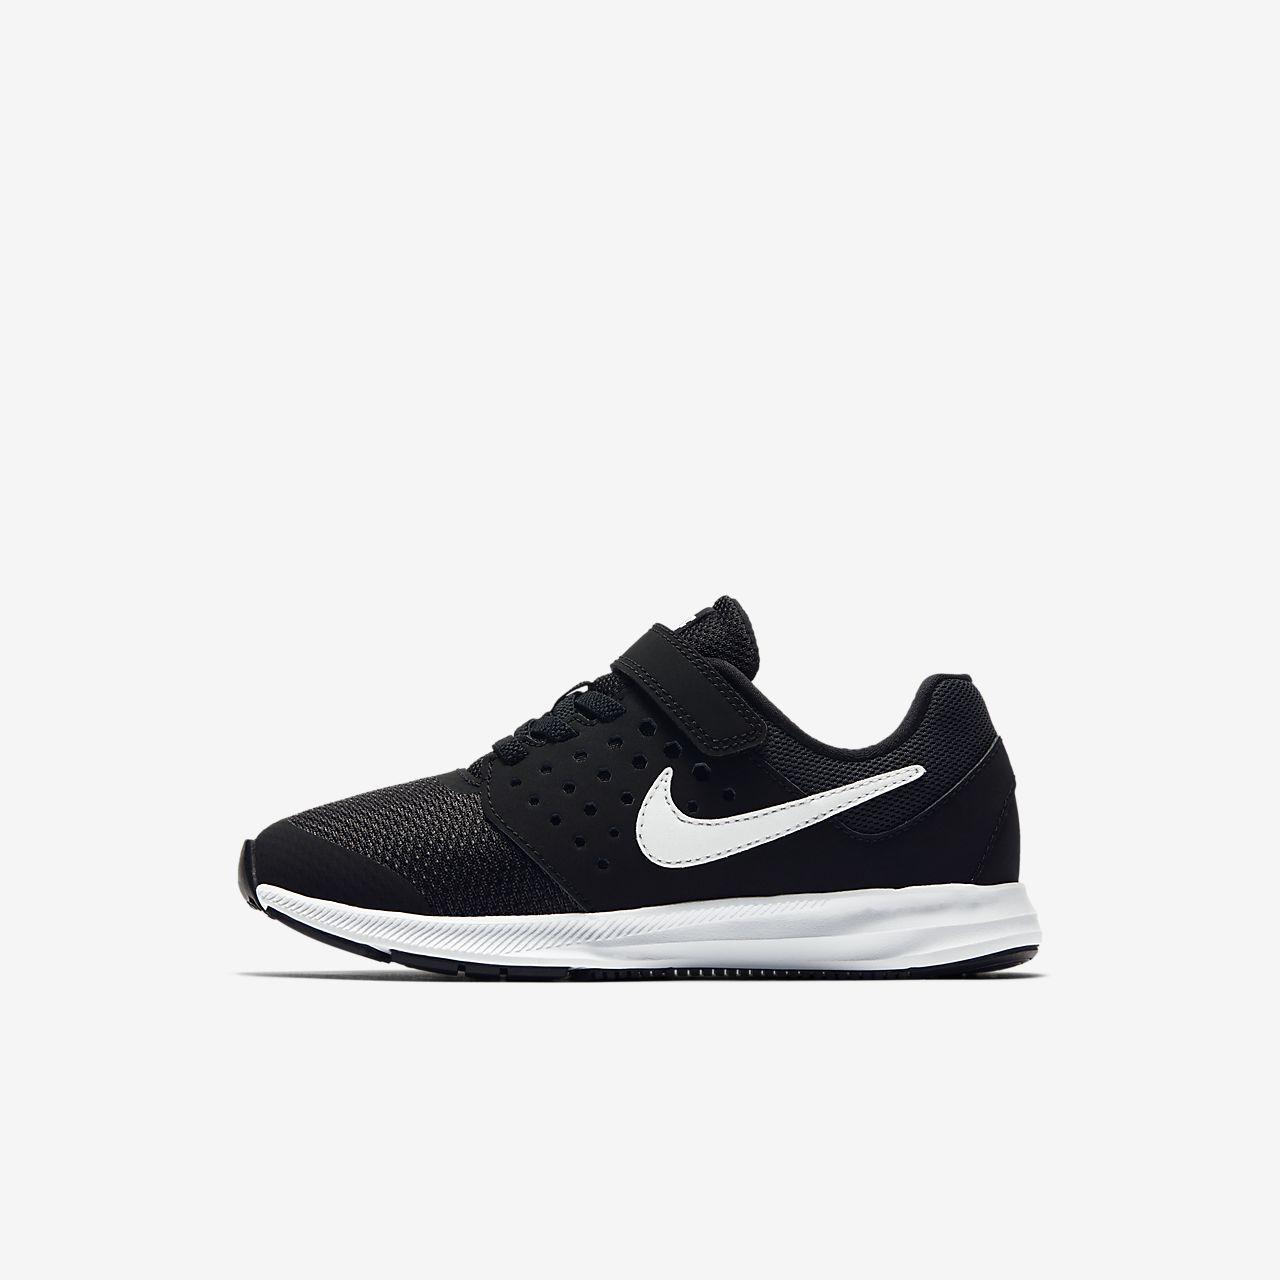 buy popular 0ed11 25481 Calzado de running para niños talla pequeña Nike Downshifter 7